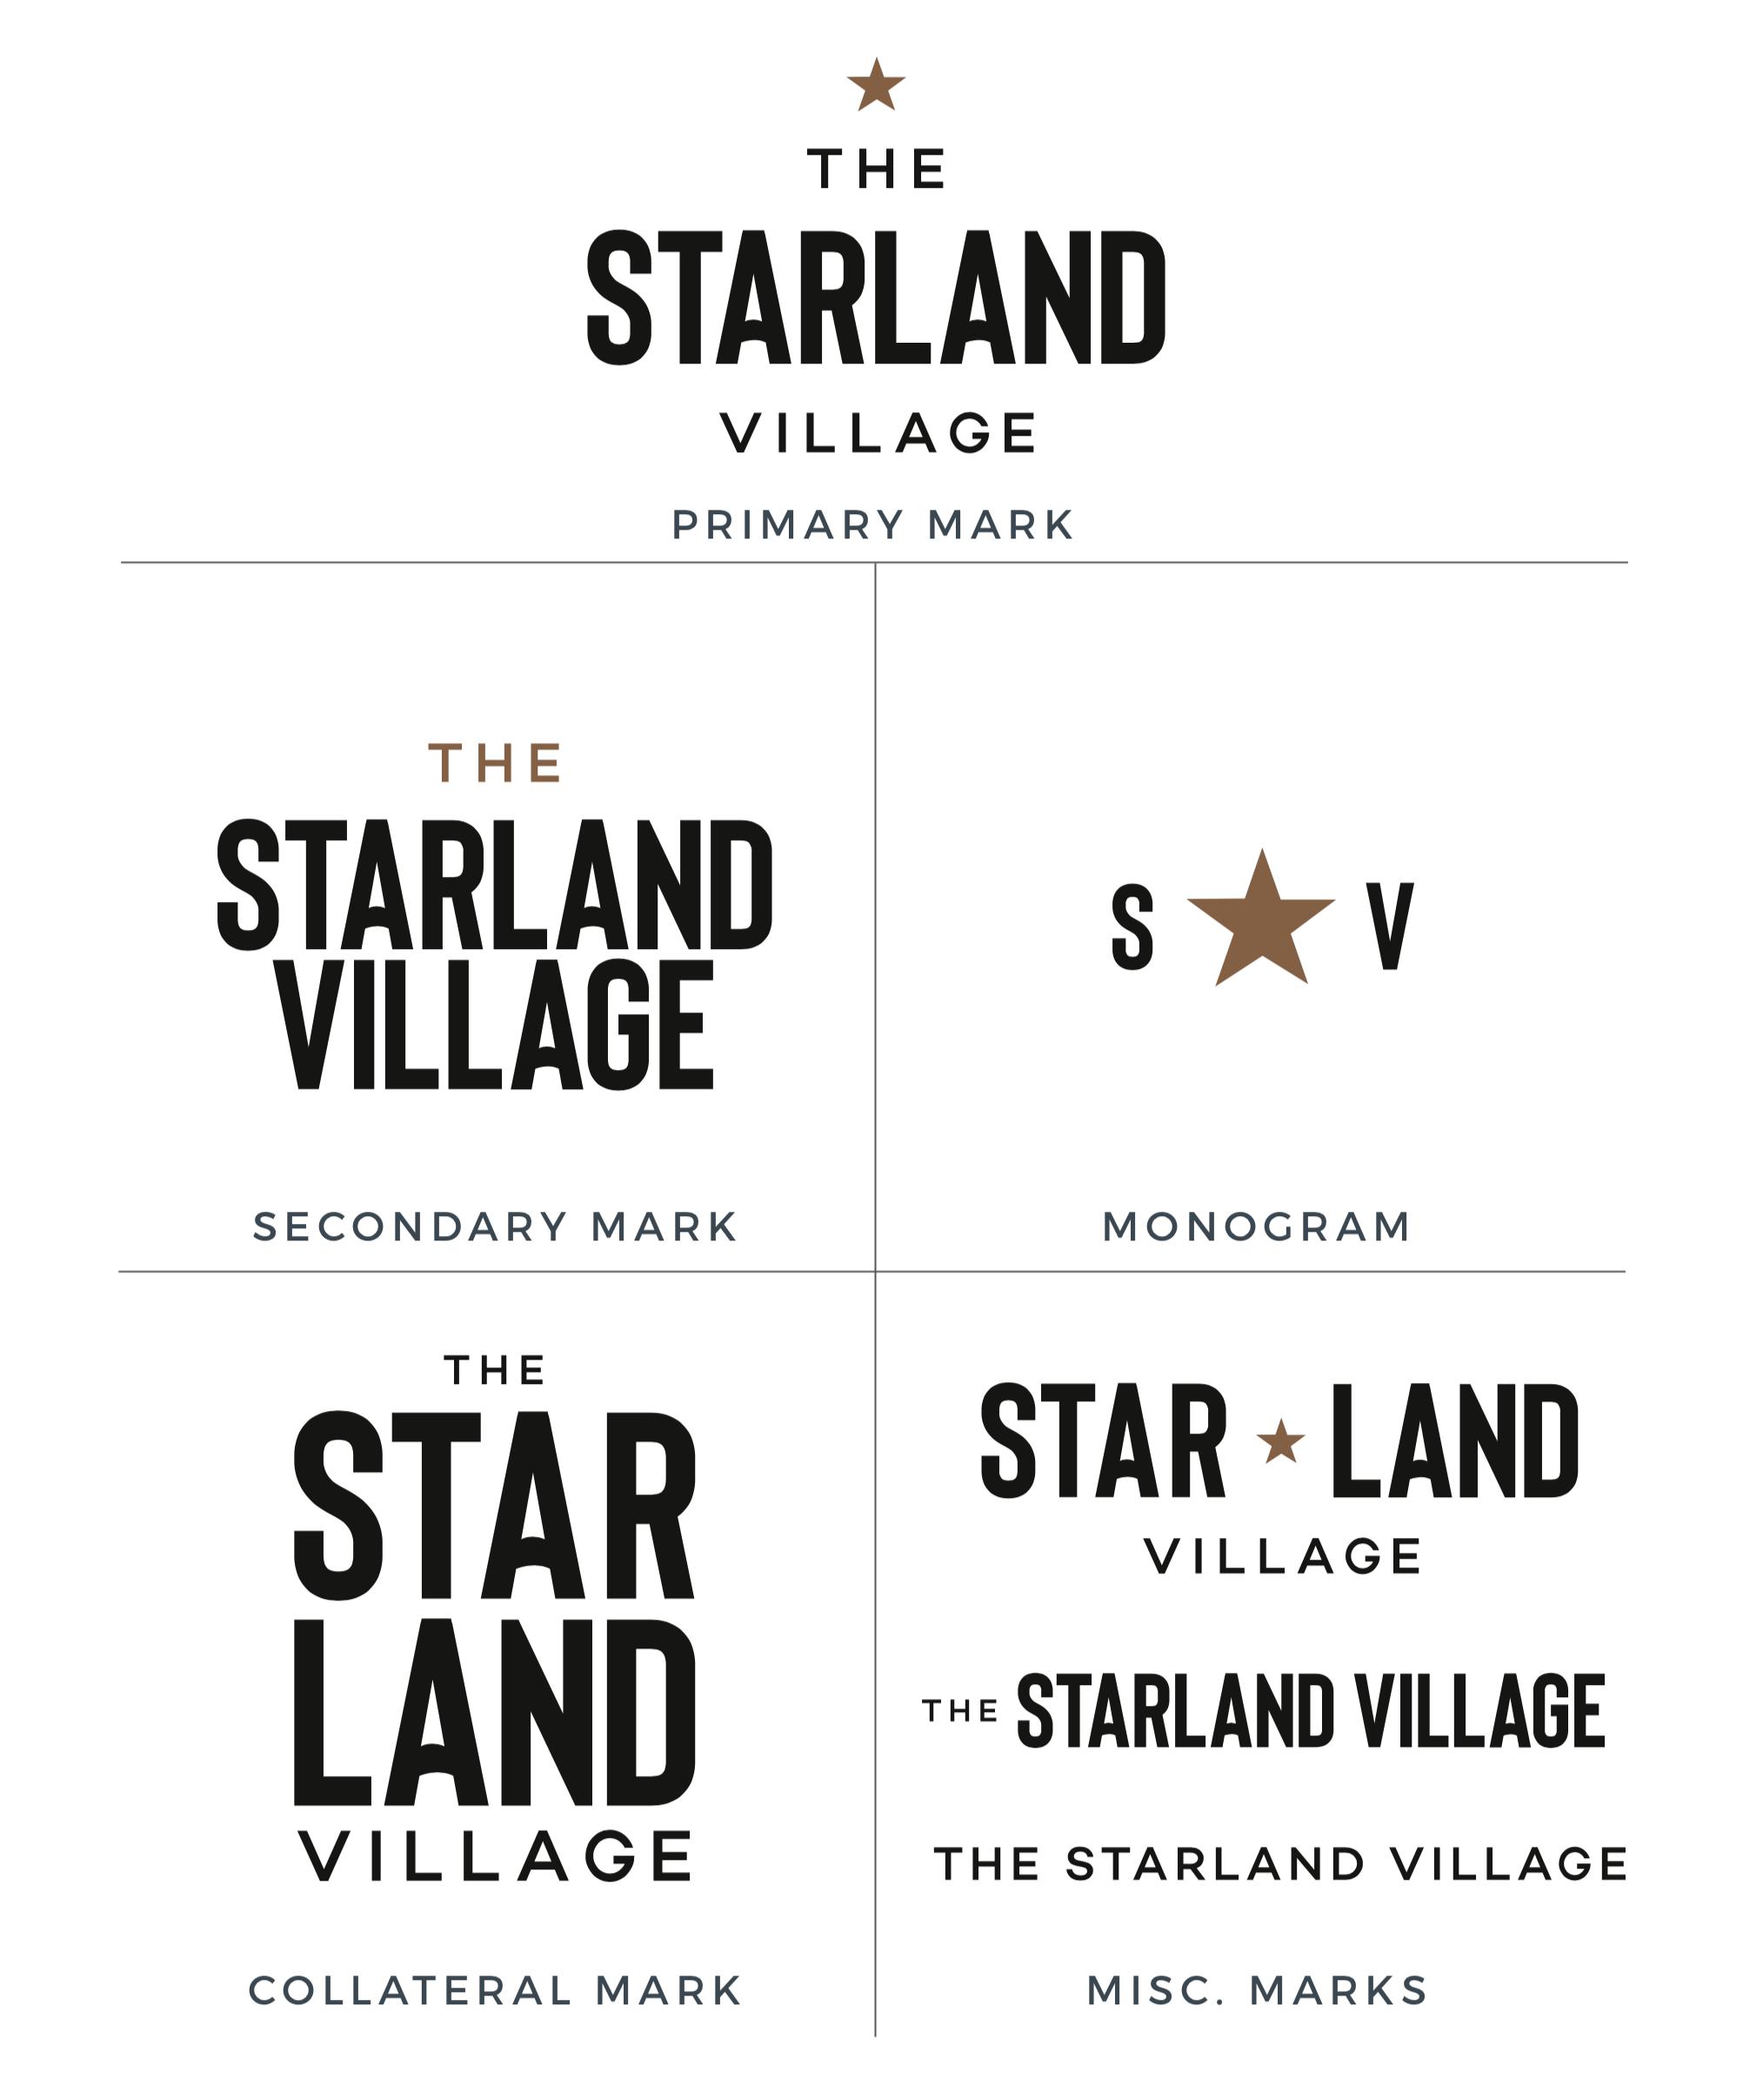 Flourish-Collaborative-Branding-Agency-Savannah-The-Starland-Village-Development-Logo2.png